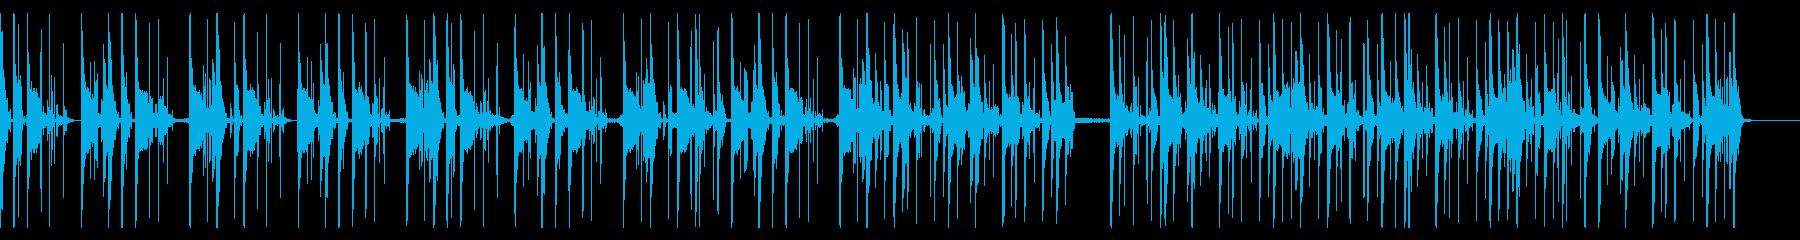 120 BPMの再生済みの波形